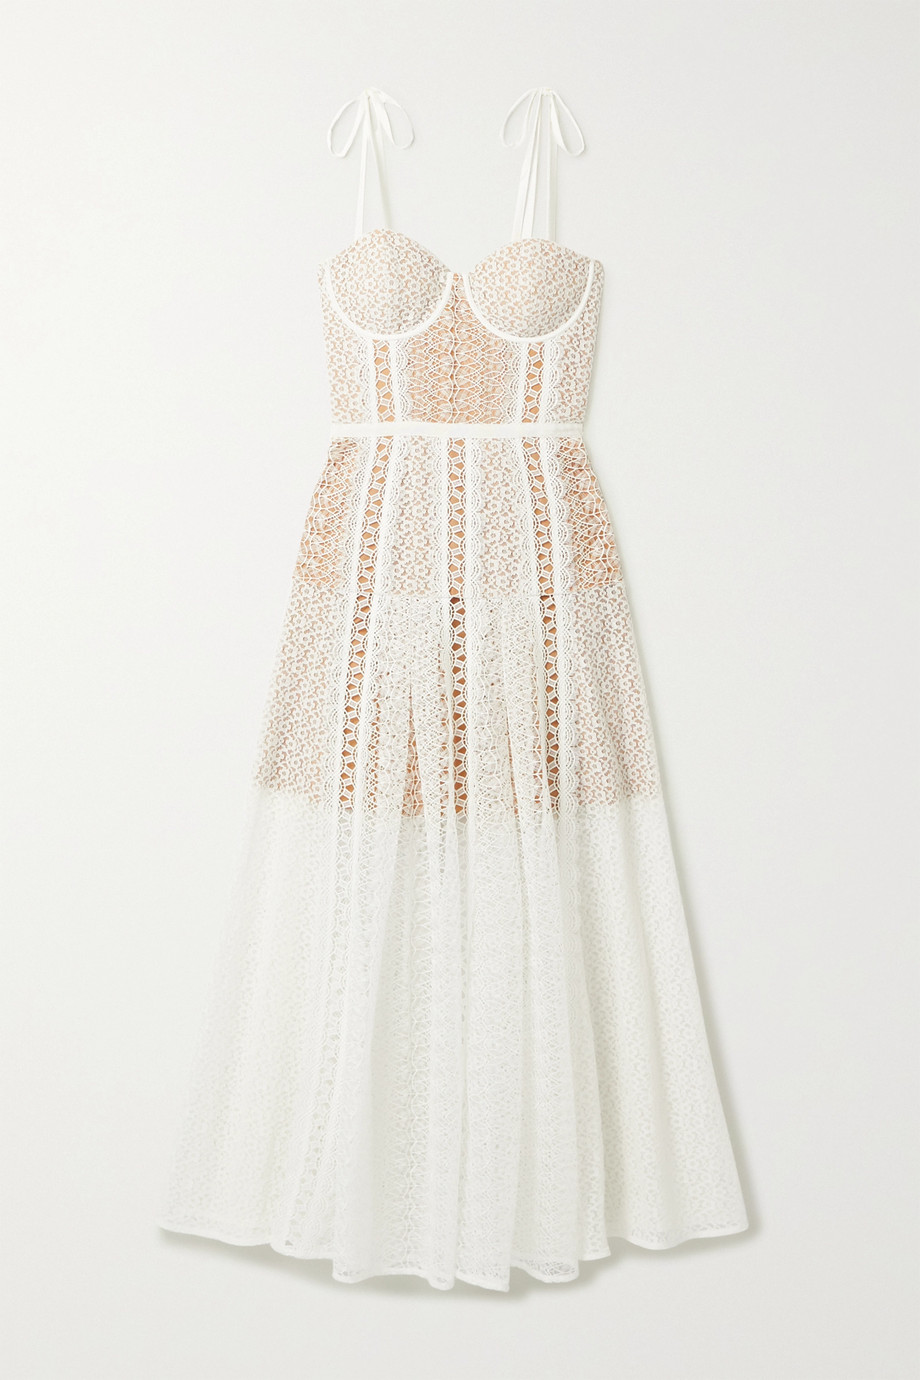 Self-Portrait Grosgrain-trimmed paneled lace midi dress